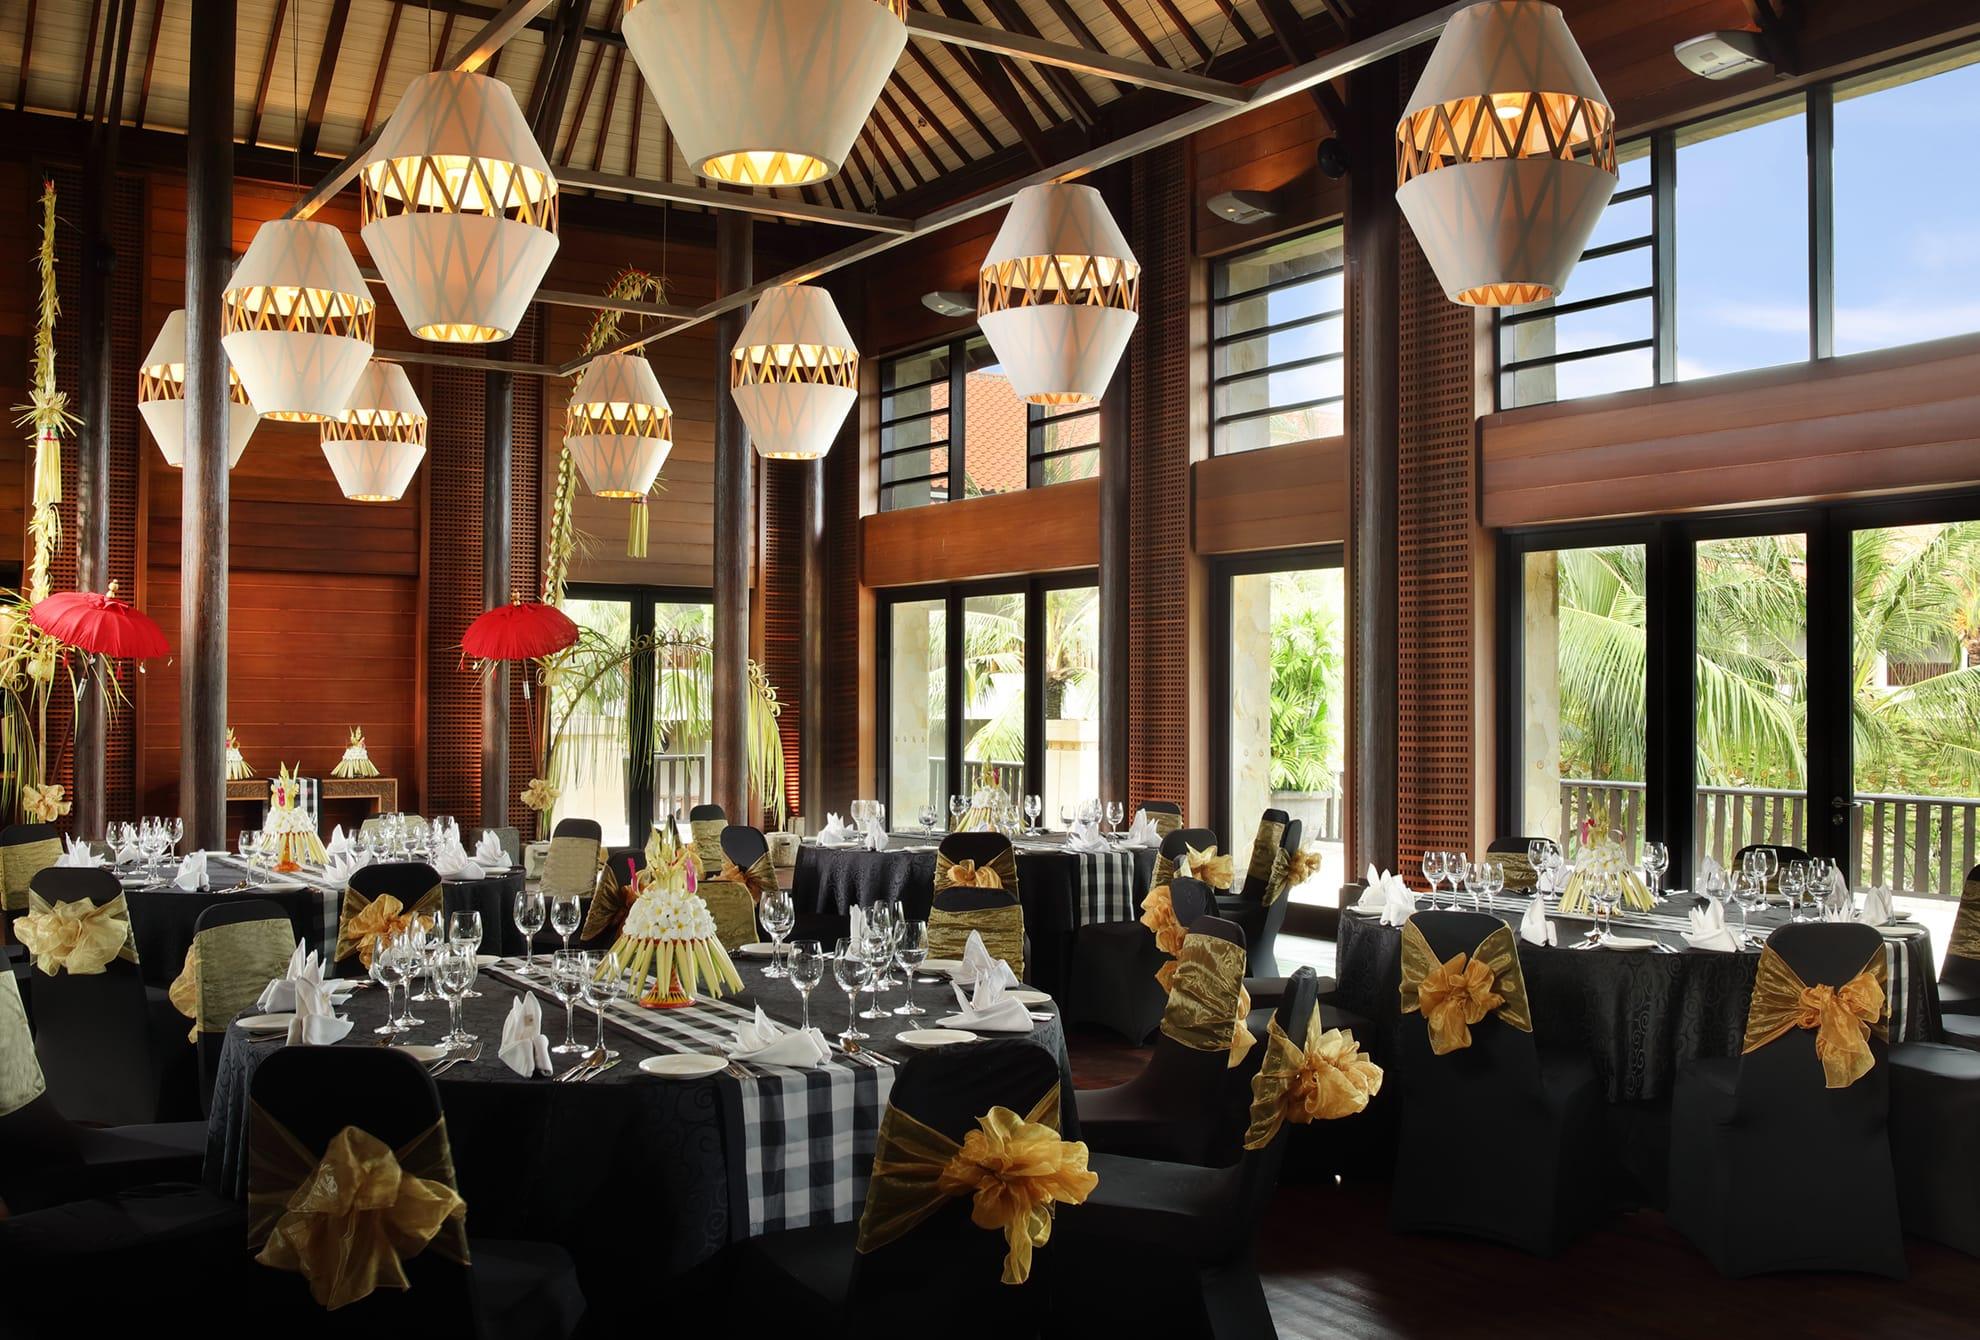 Destination Wedding In Bali - The Island Of Gods